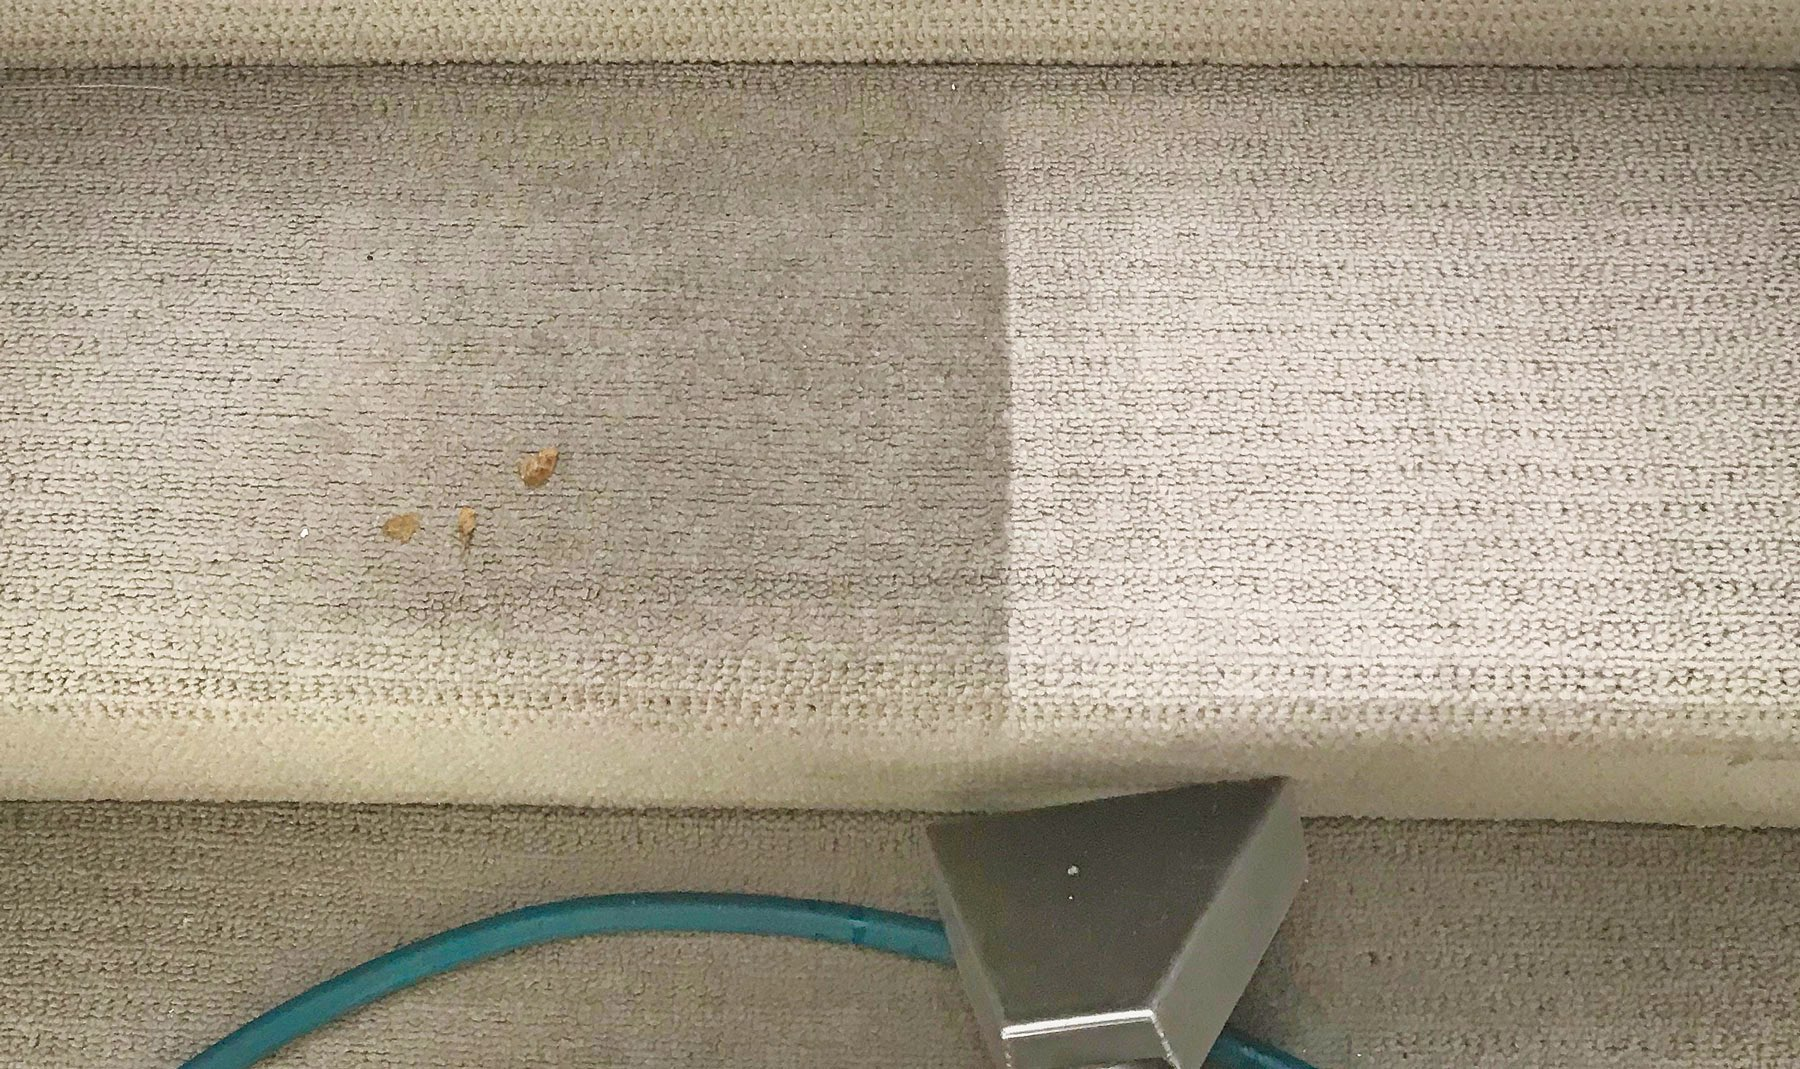 Nest Carpet Cleaning Brisbane